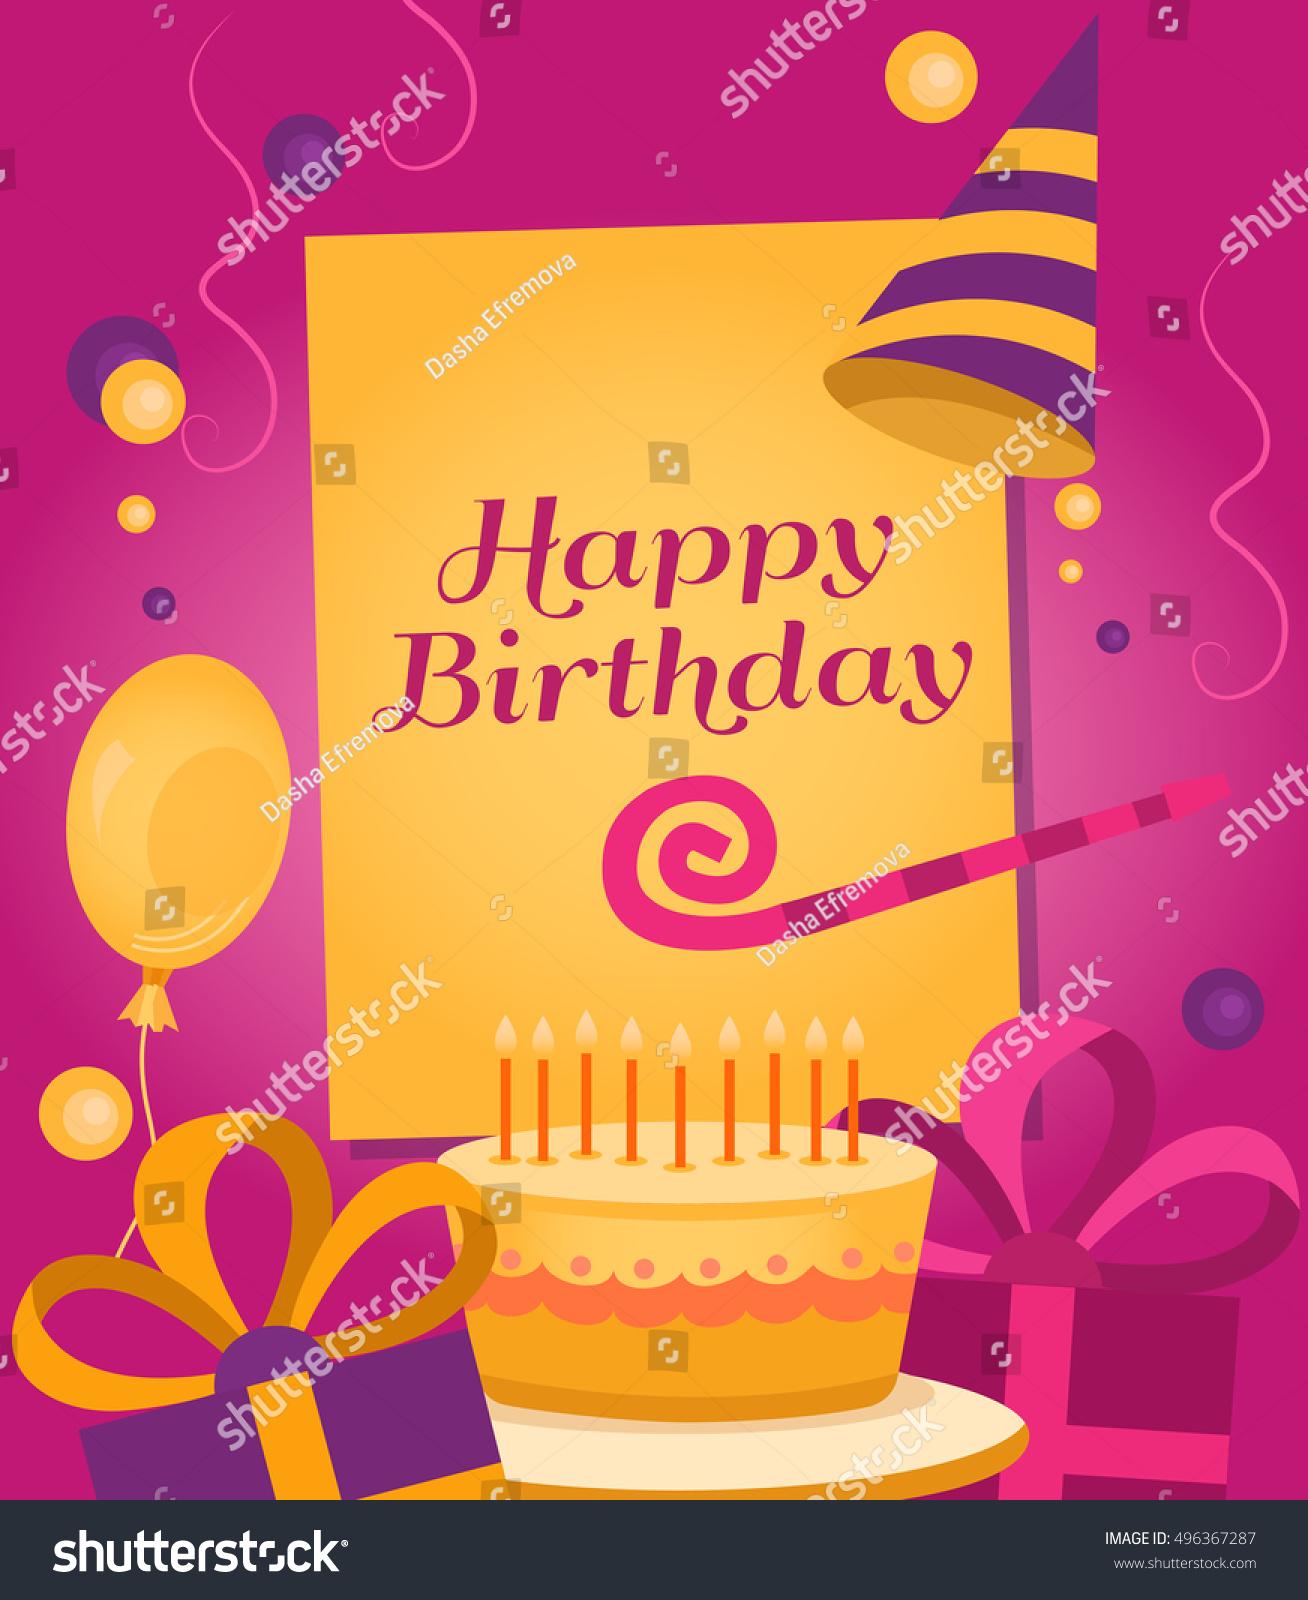 Happy Birthday Banner Gift Cake Balloon Stock Vector